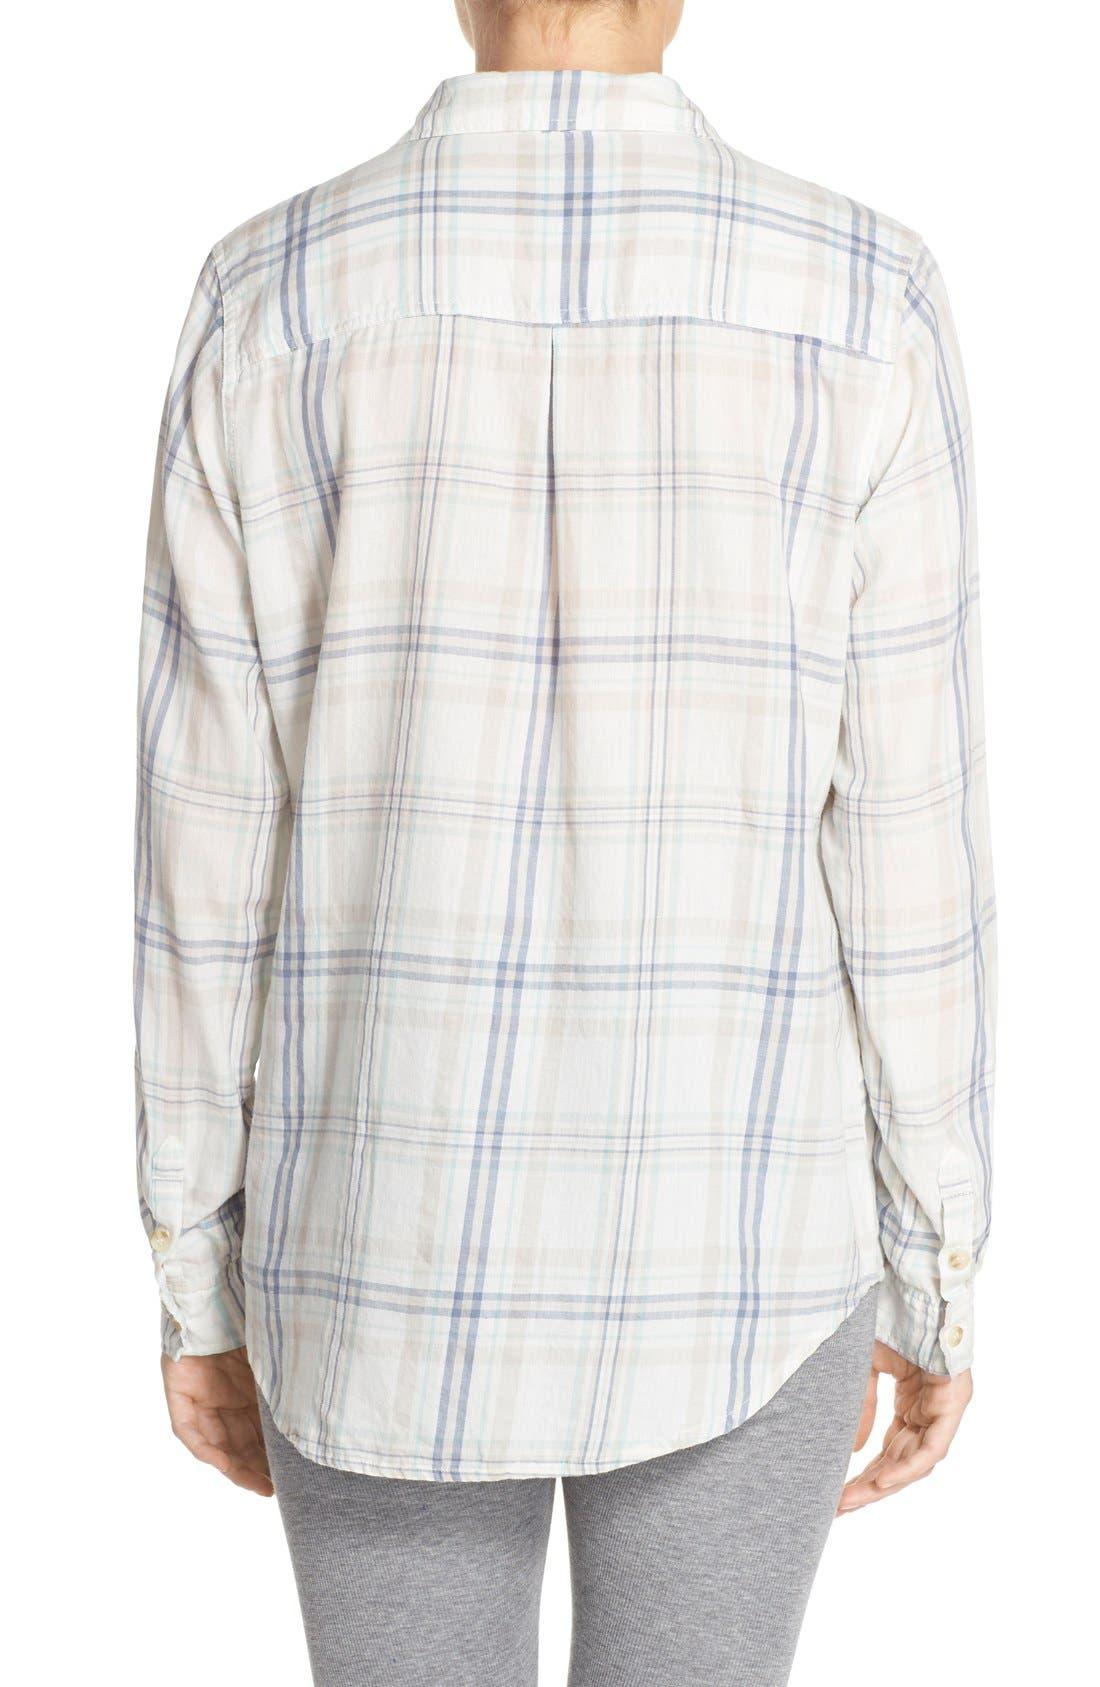 Alternate Image 2  - PJ Salvage Plaid Cotton Twill Shirt